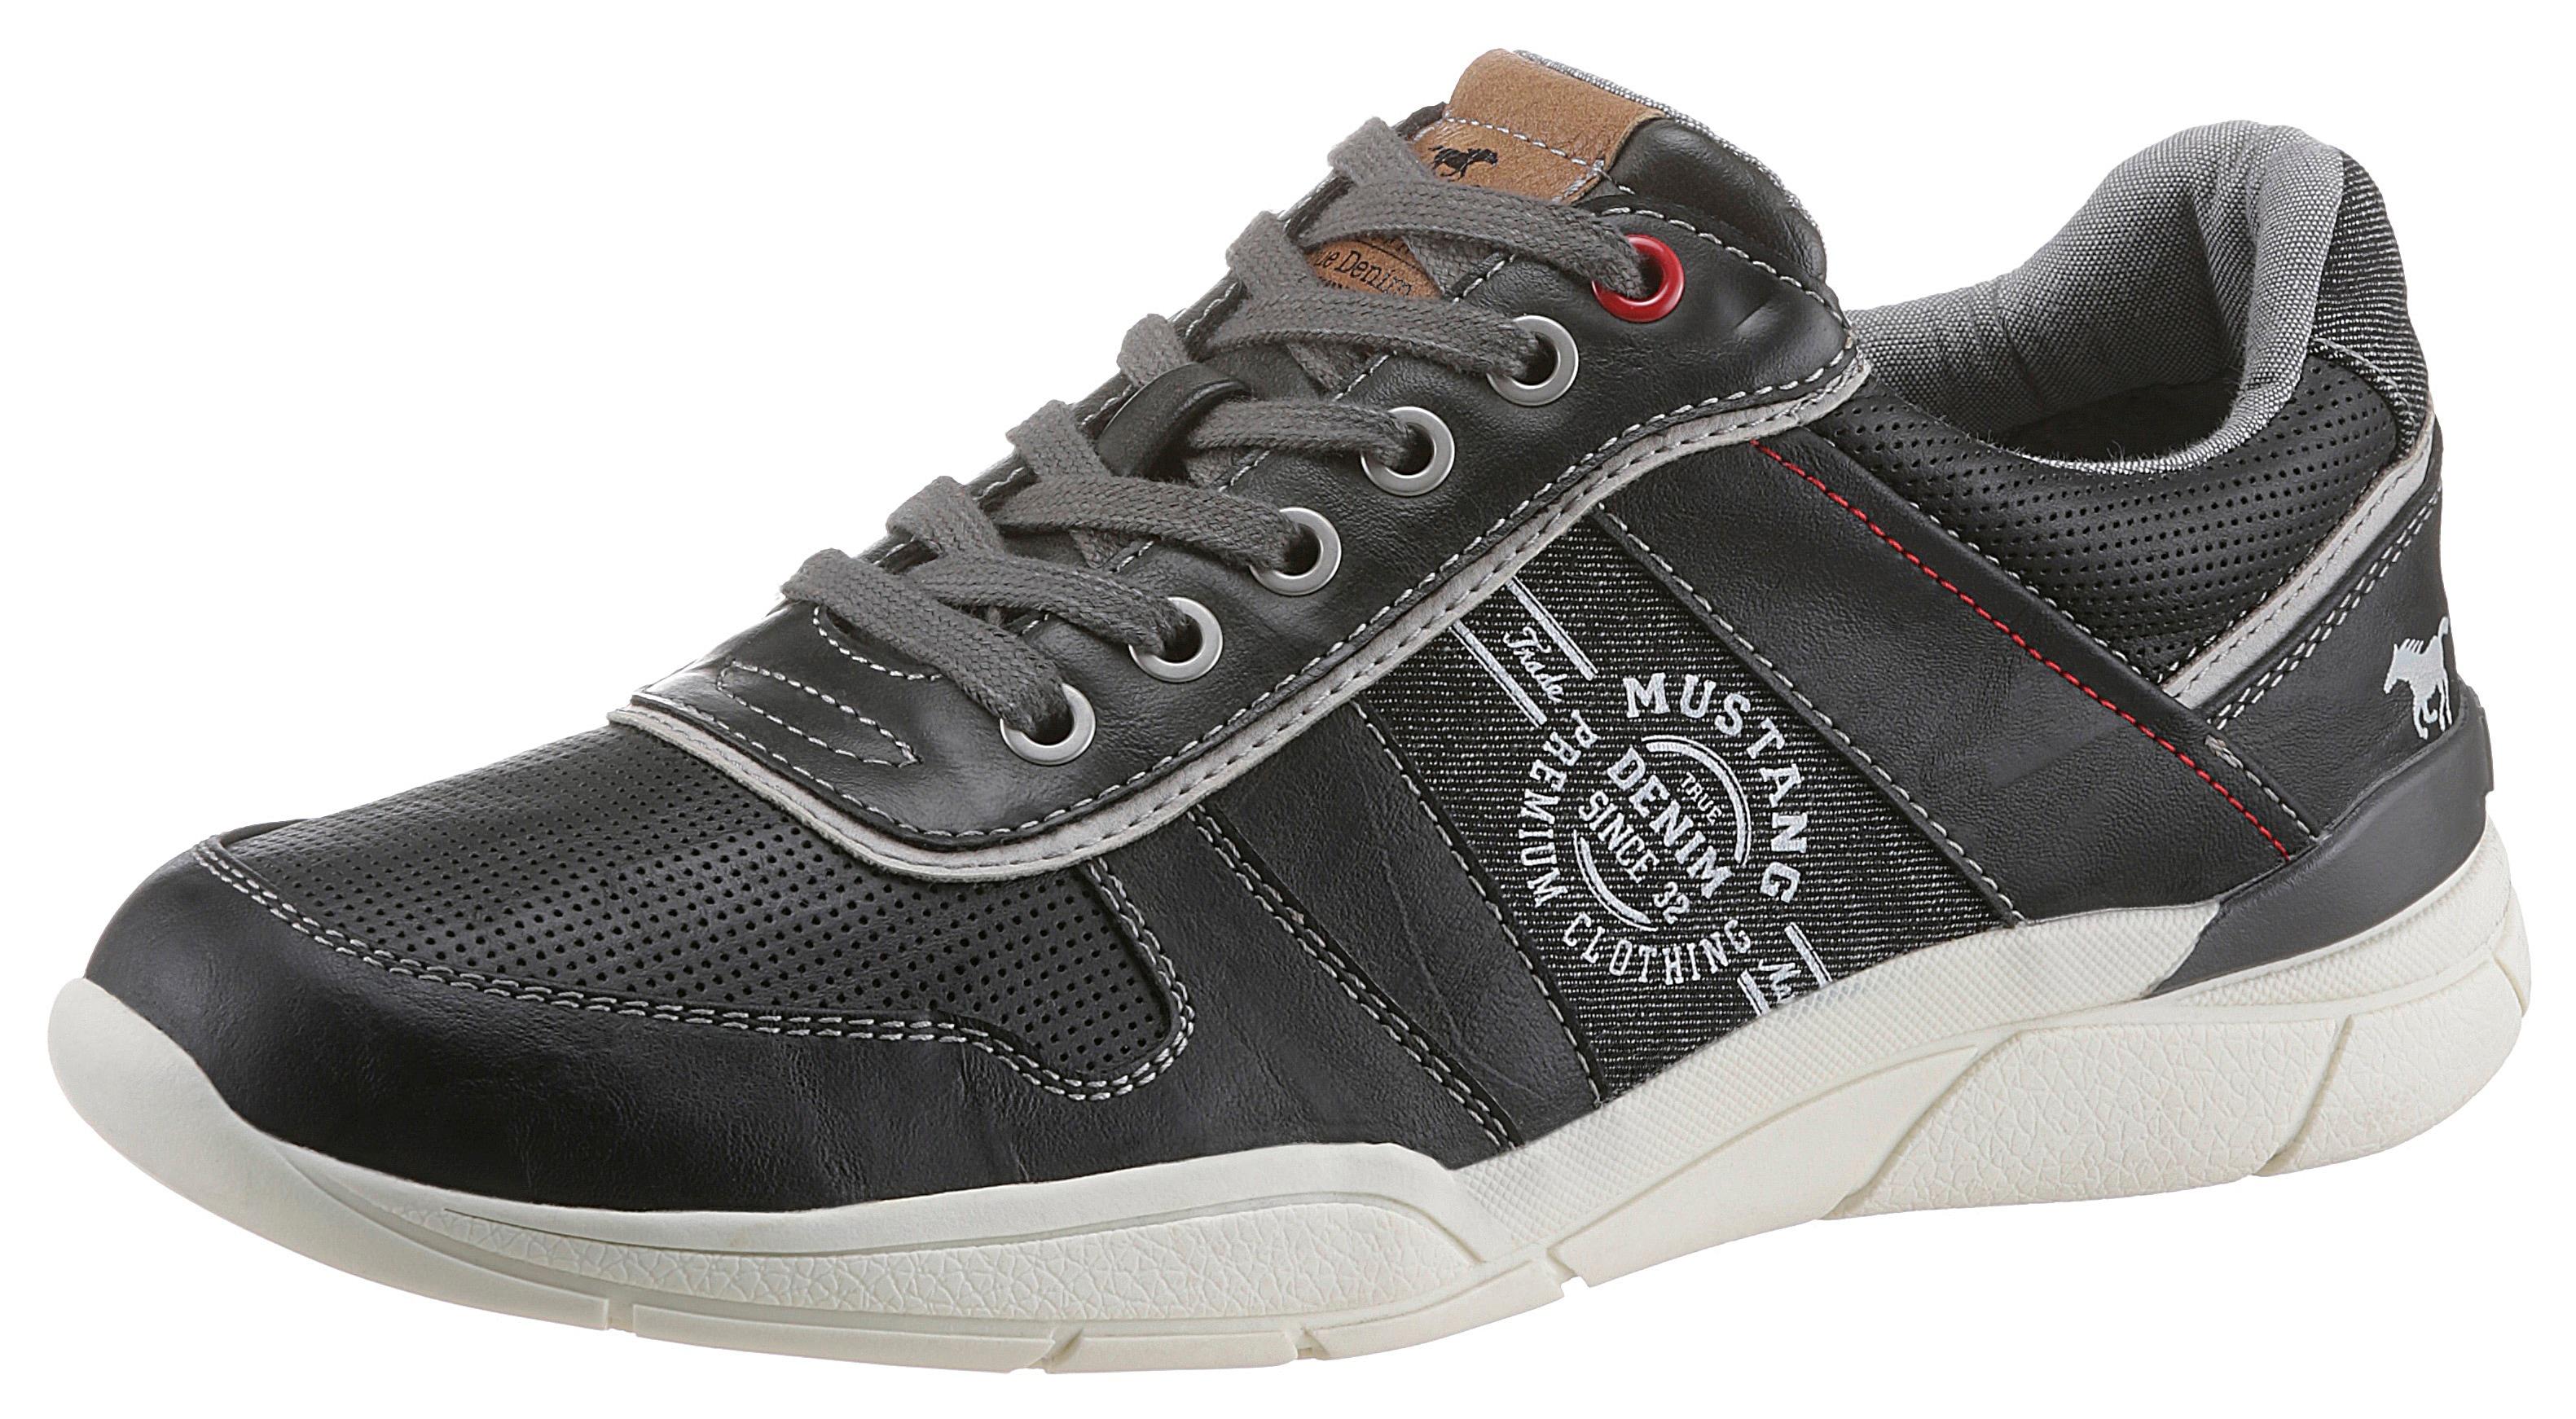 mustang shoes -  Sneaker, mit herausnehmbarer Innensohle